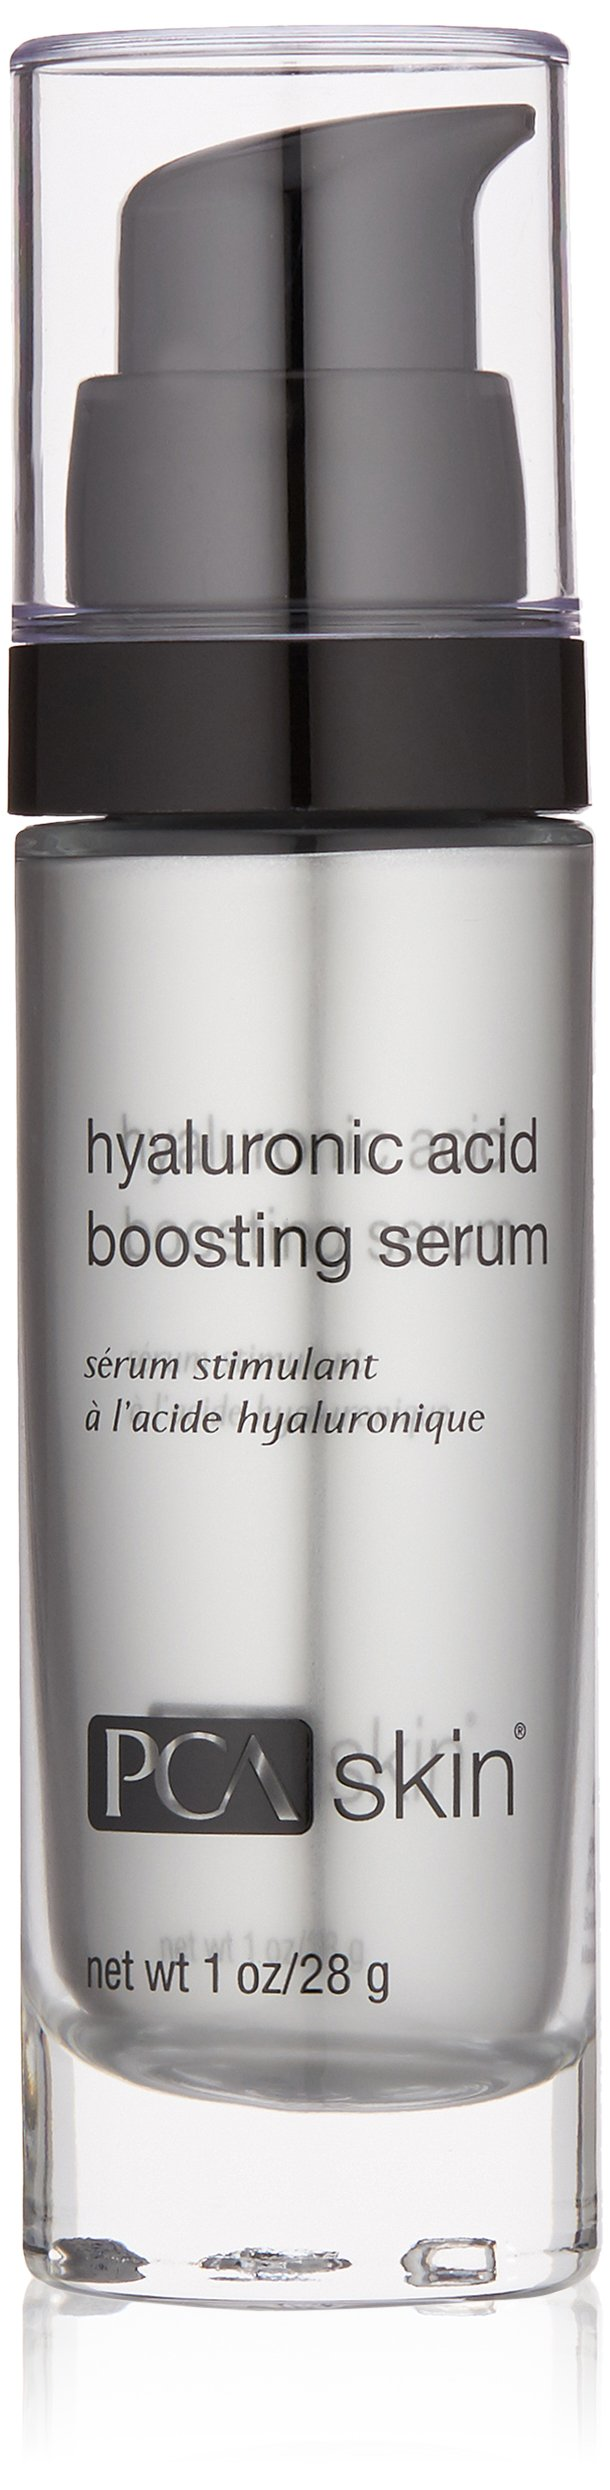 PCA SKIN Hyaluronic Acid Boosting Serum, 1 oz.